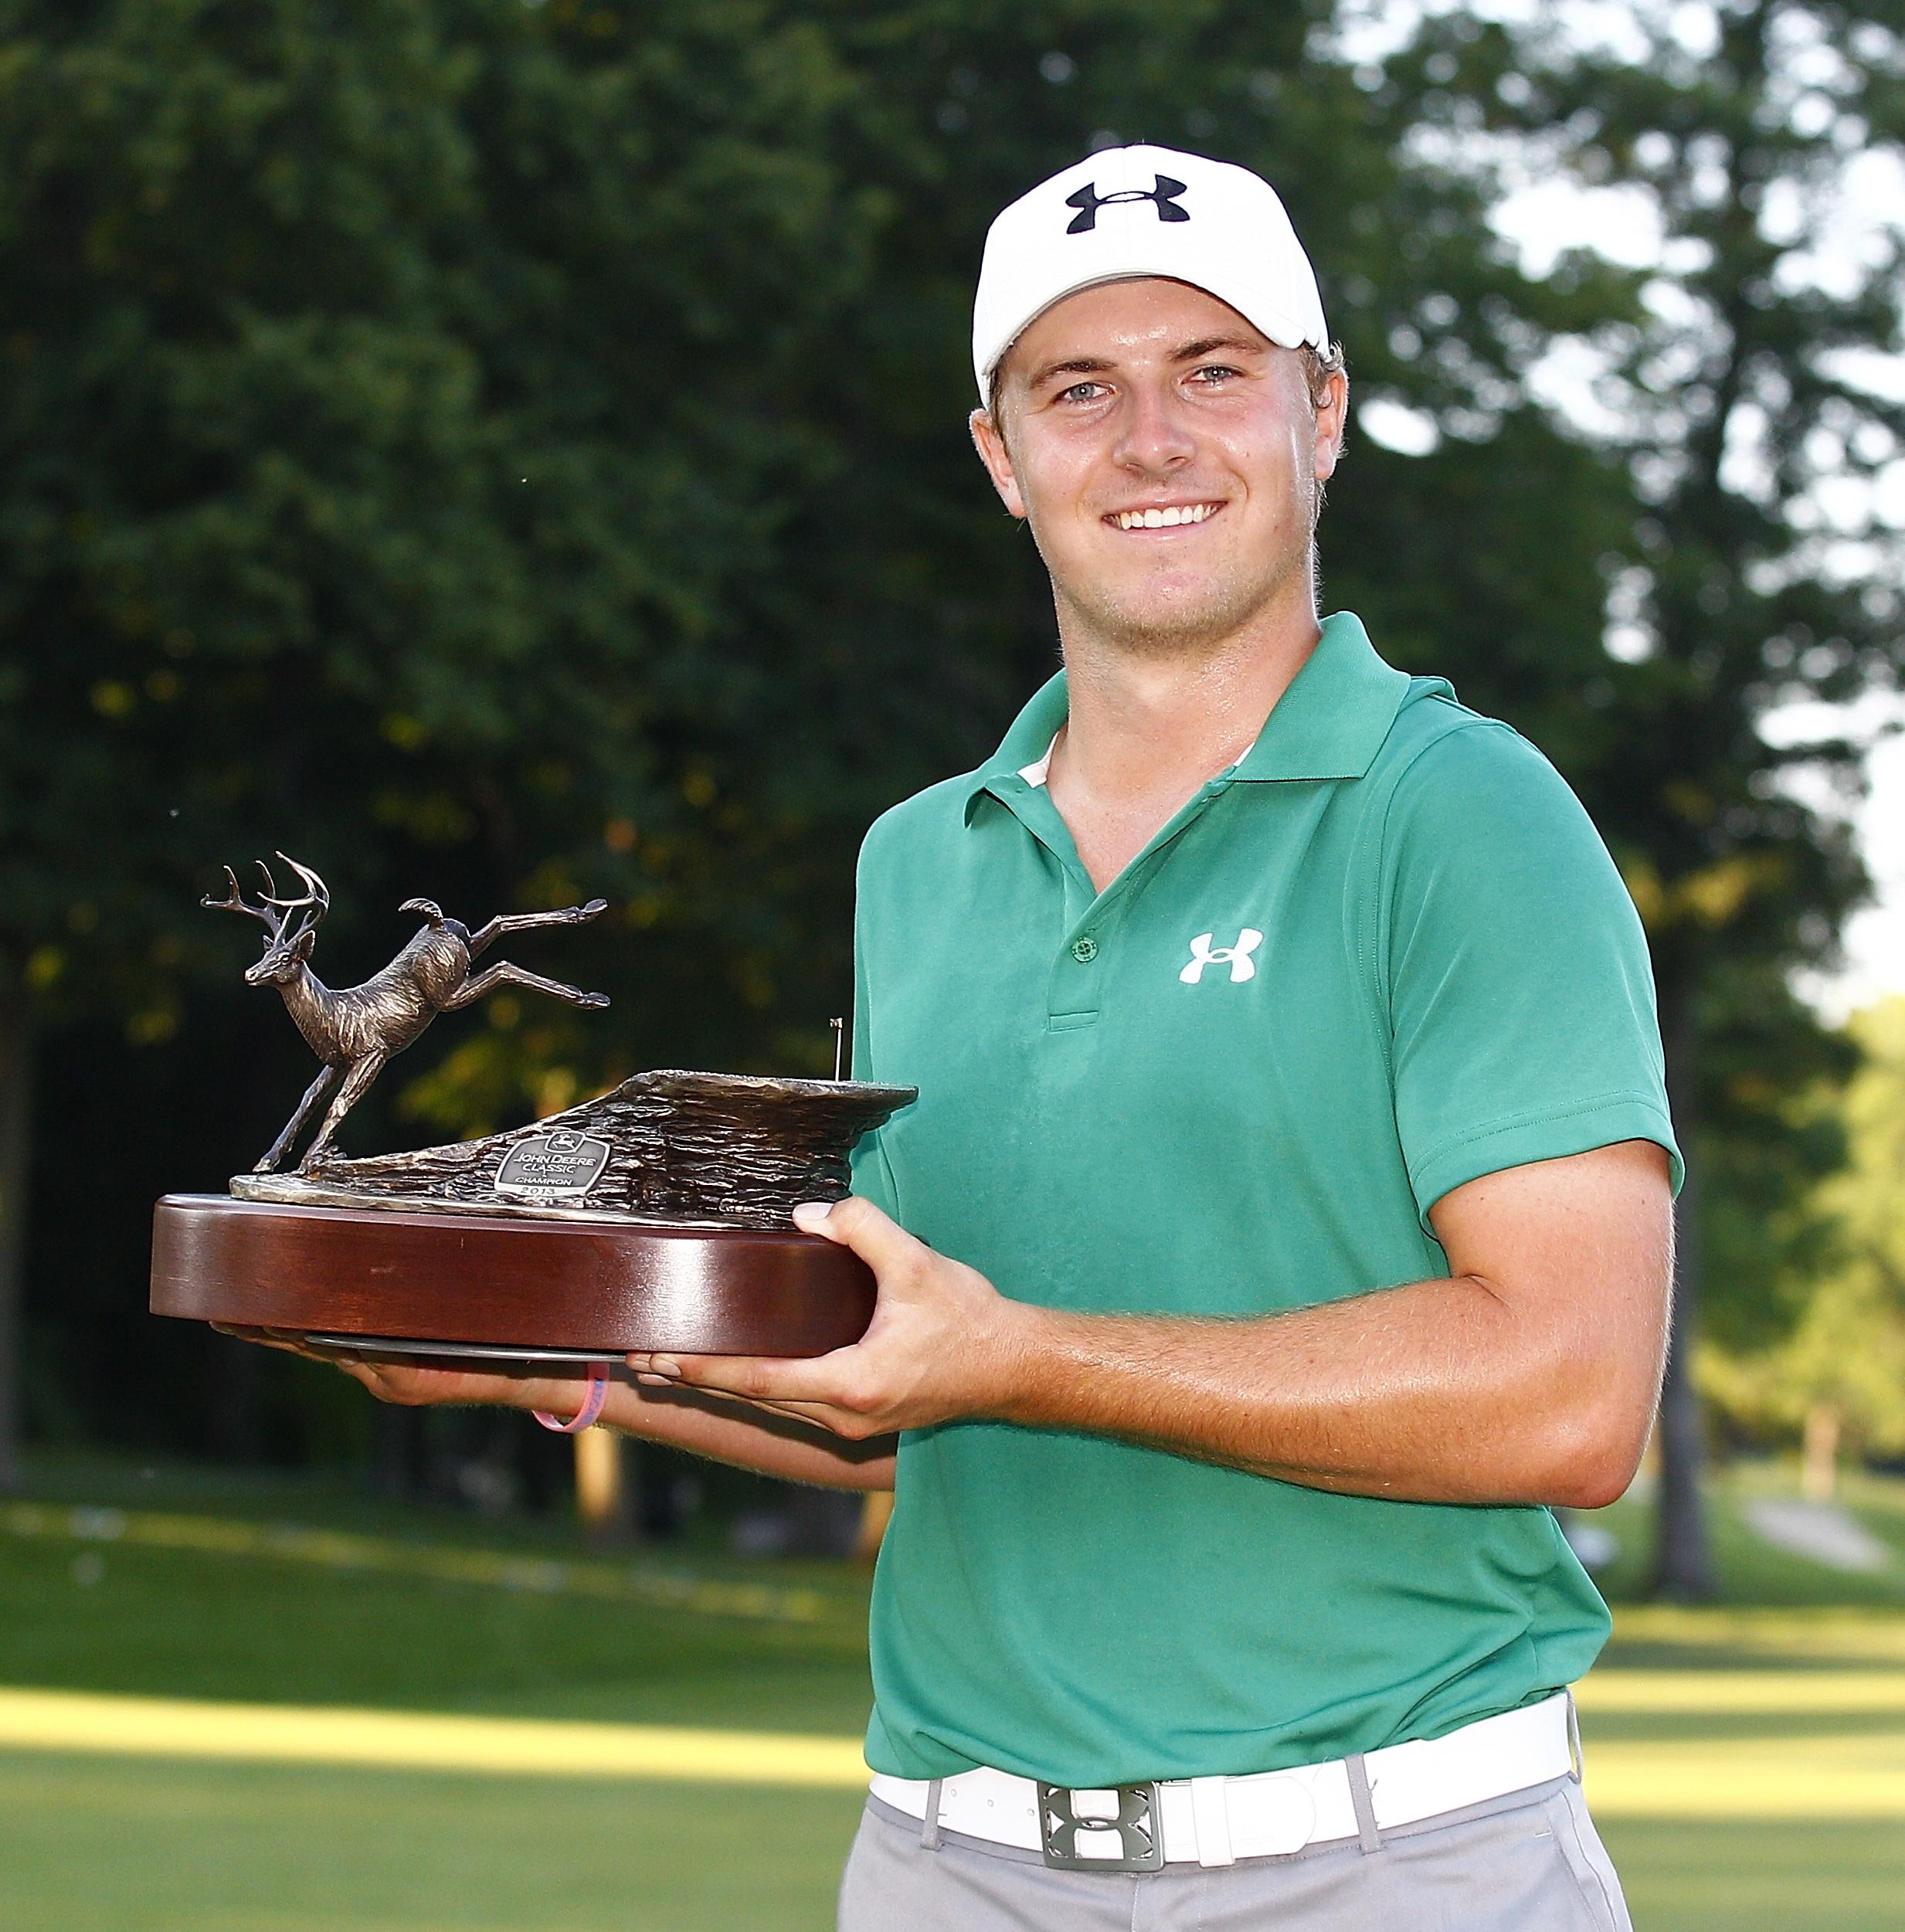 PGA winner Jordan Spieth poses with the DeMille-designed John Deere Classic trophy (Photo courtsey of John Deere Classic)